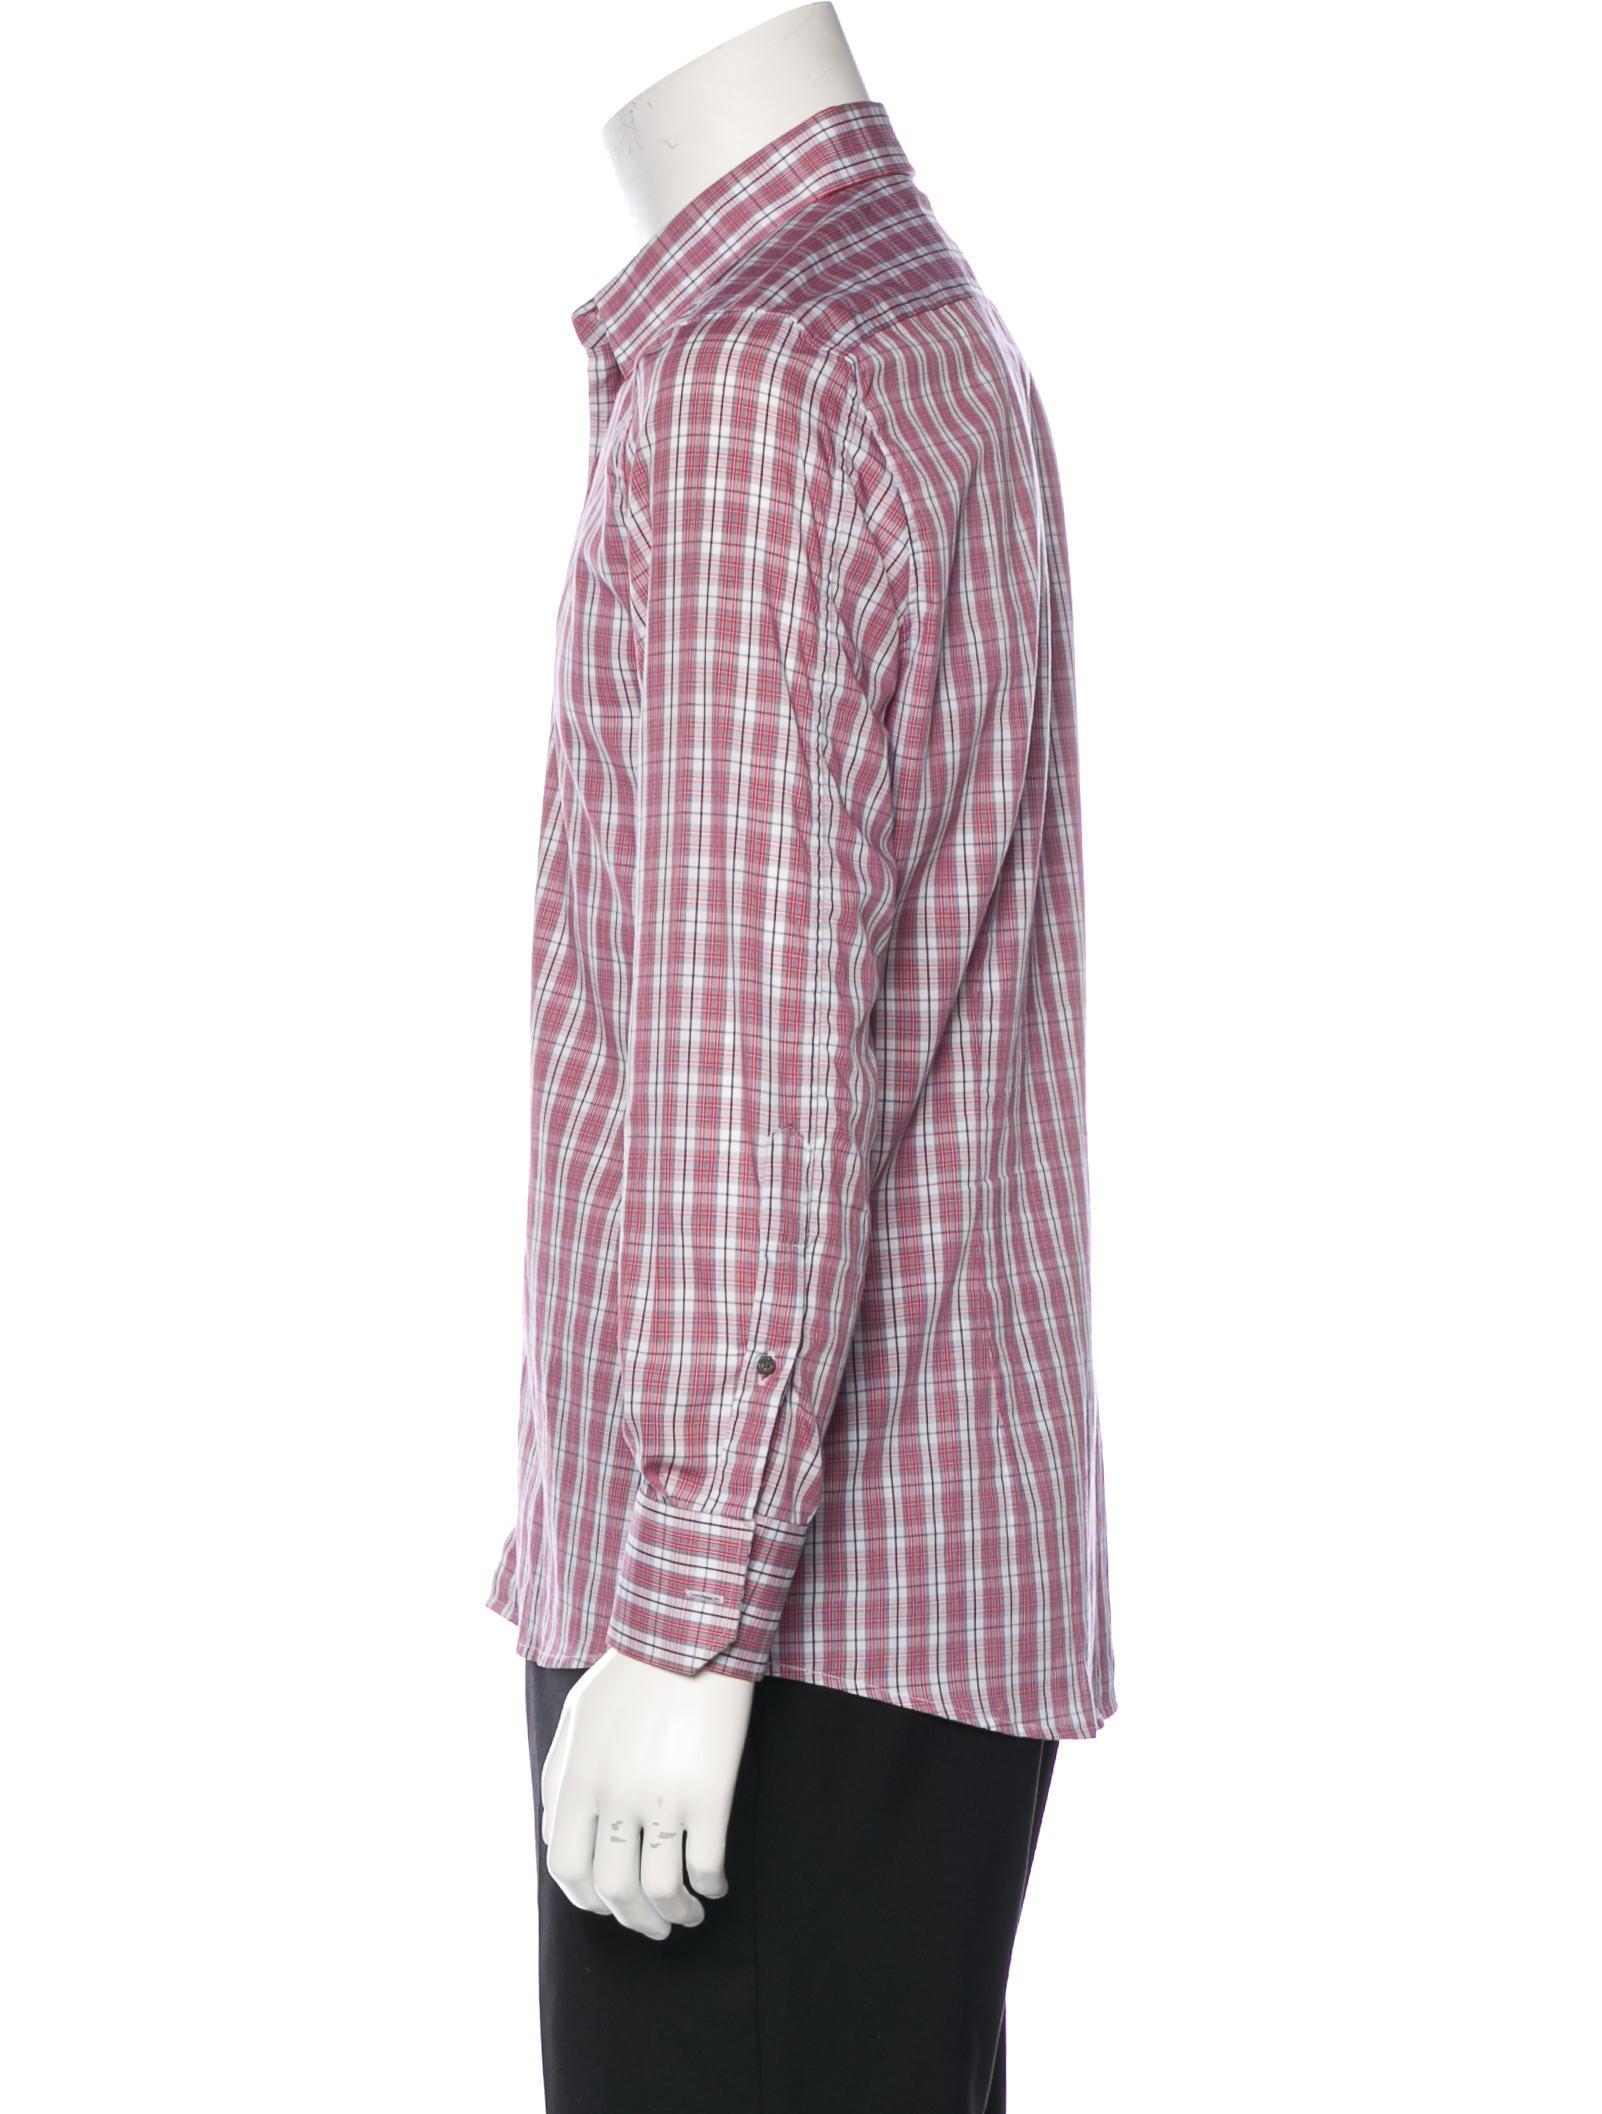 Gucci Plaid Dress Shirt Clothing Guc131590 The Realreal